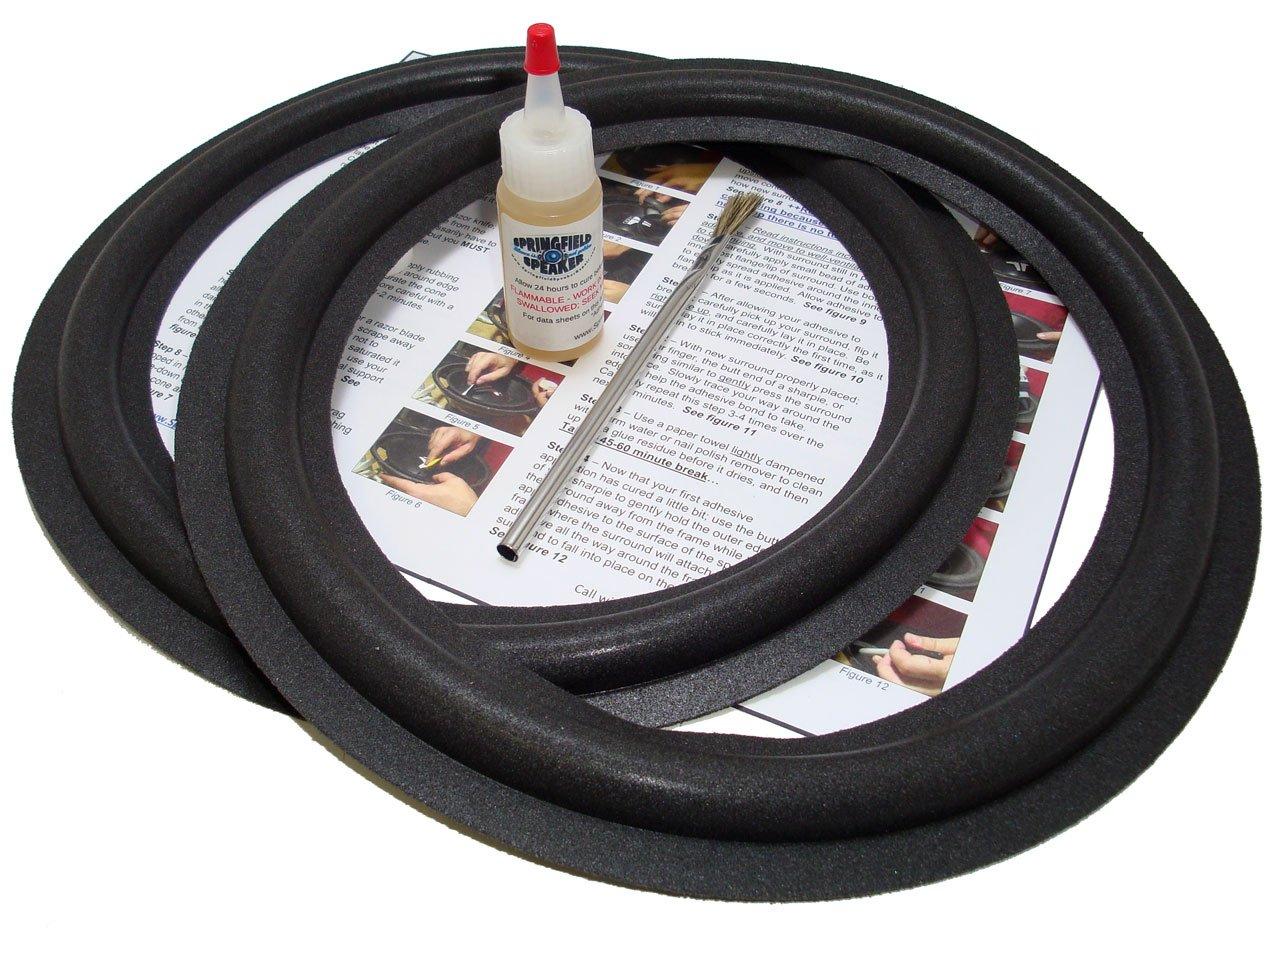 "MK Miller and Kreisel 12"" Speaker Foam Surround Repair Kit - M&K 12 Inch"